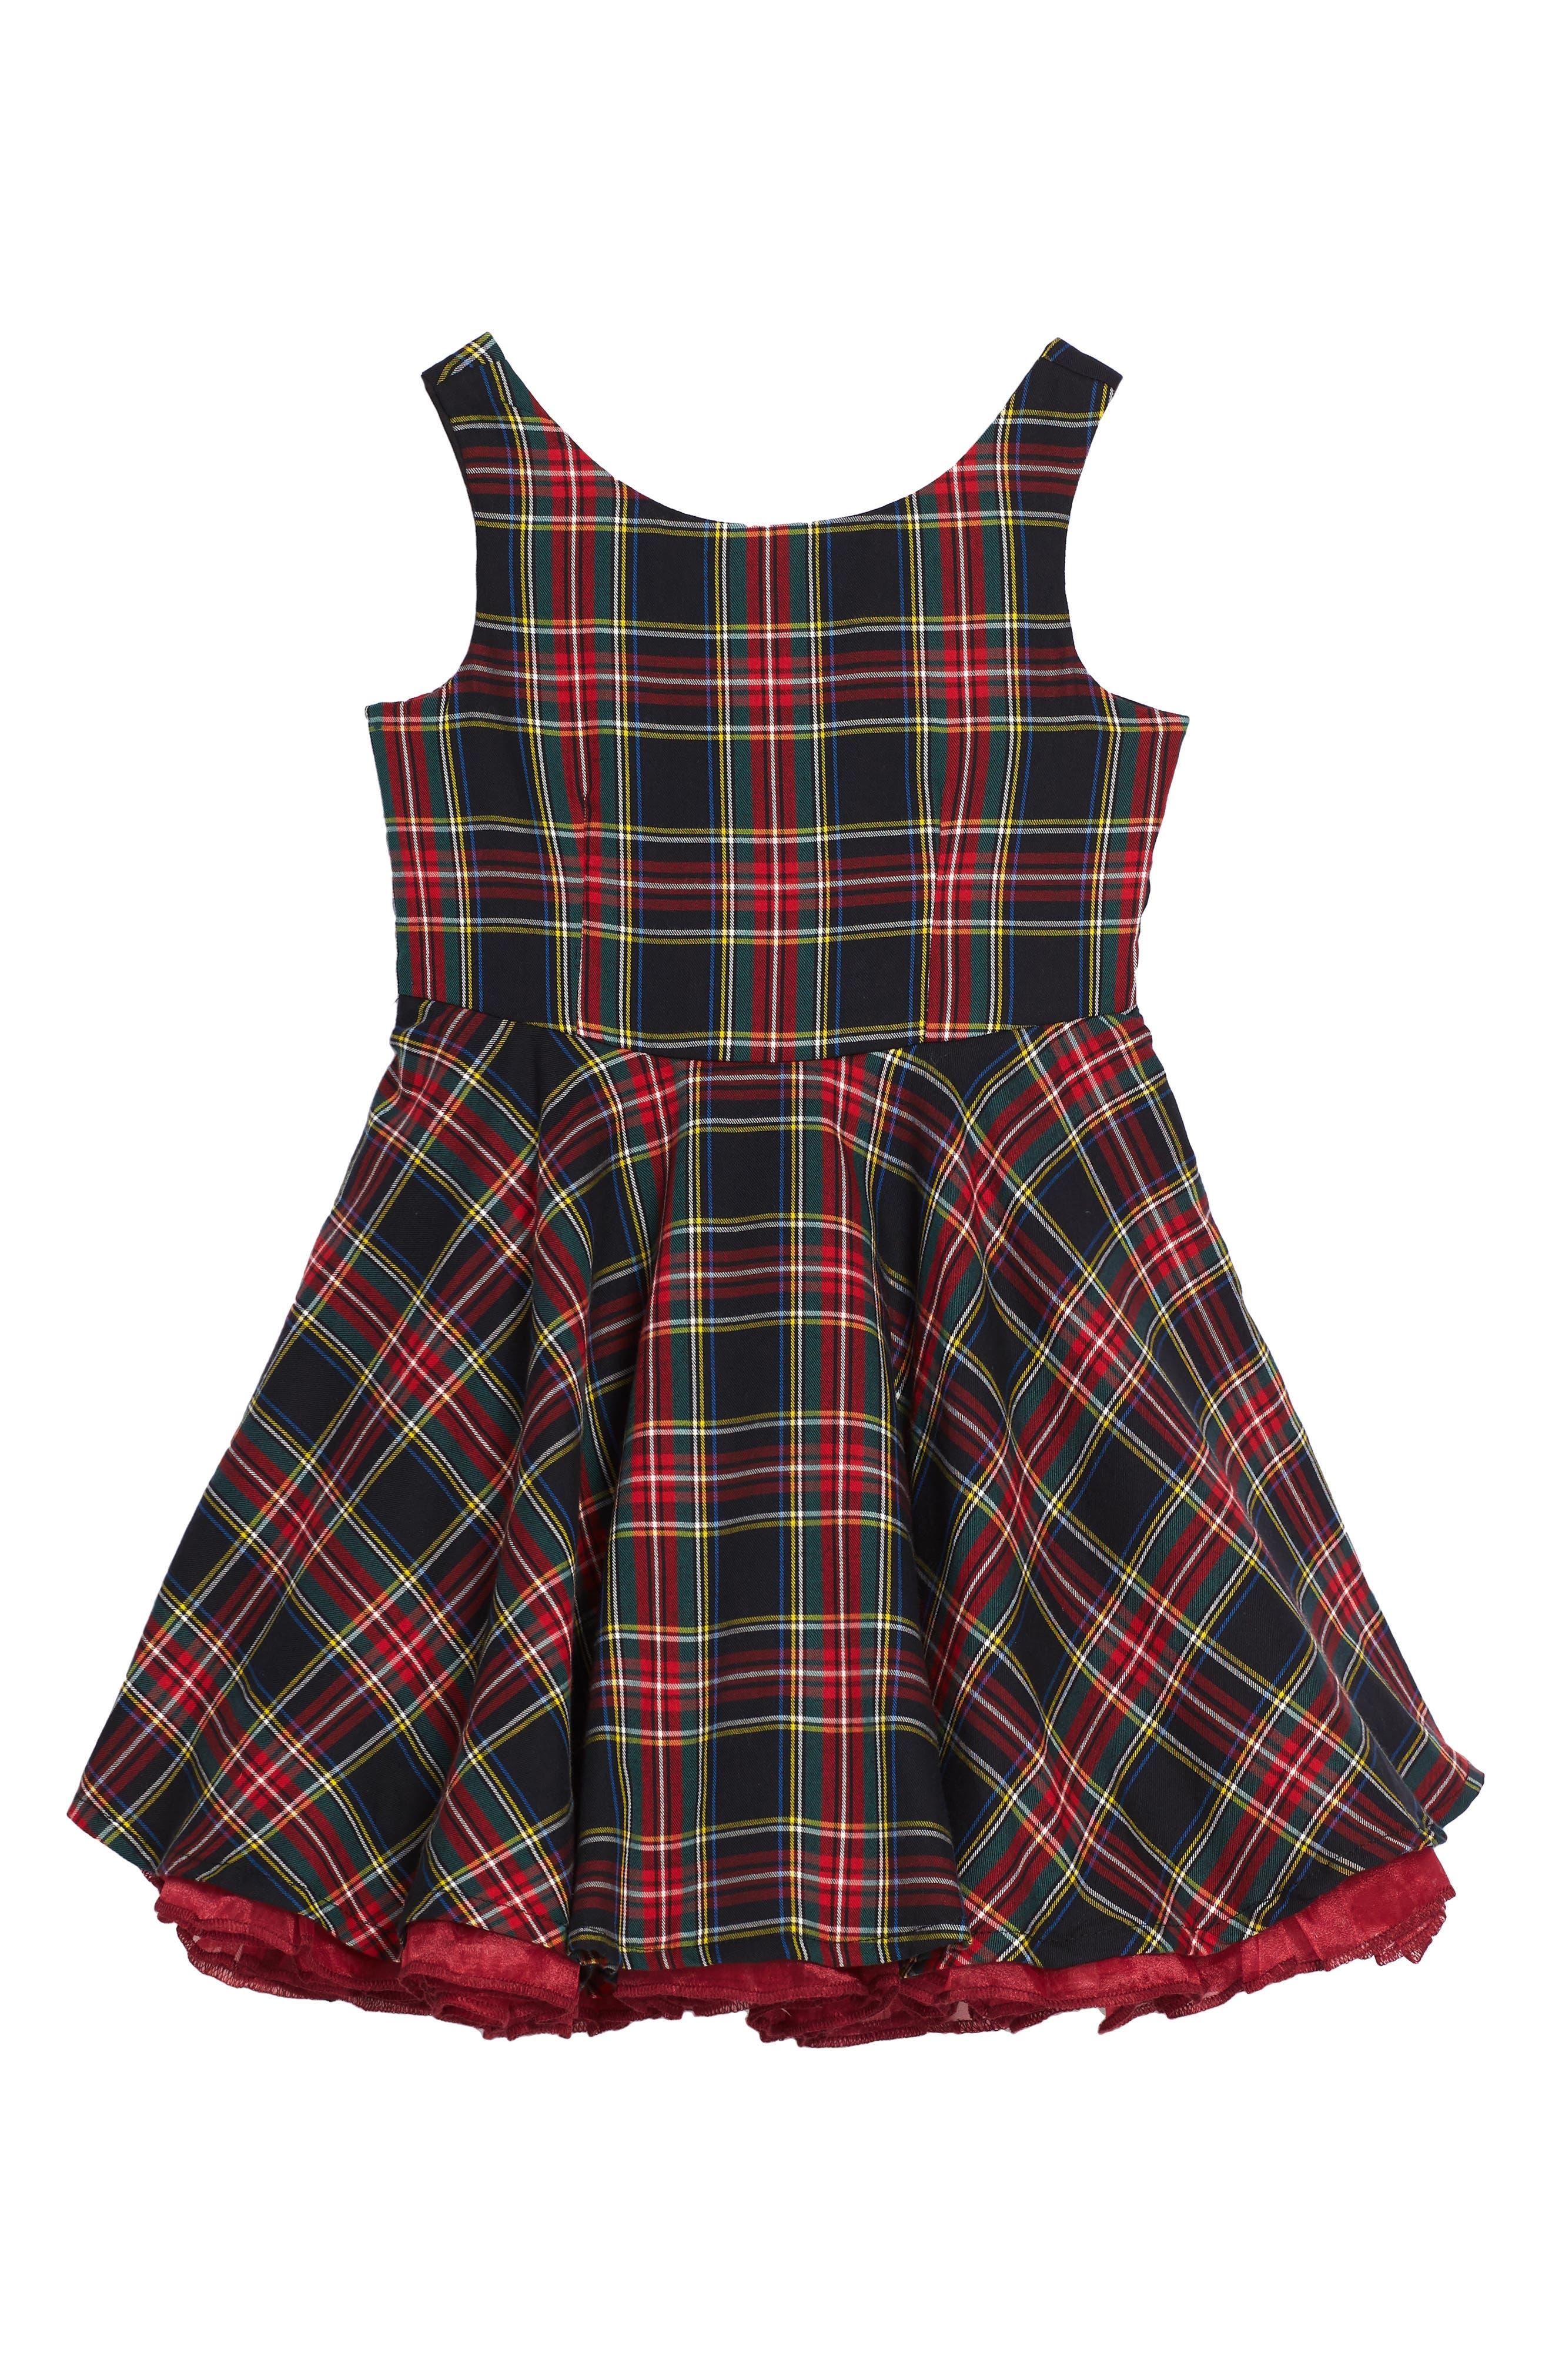 Tartan Party Dress,                             Main thumbnail 1, color,                             600